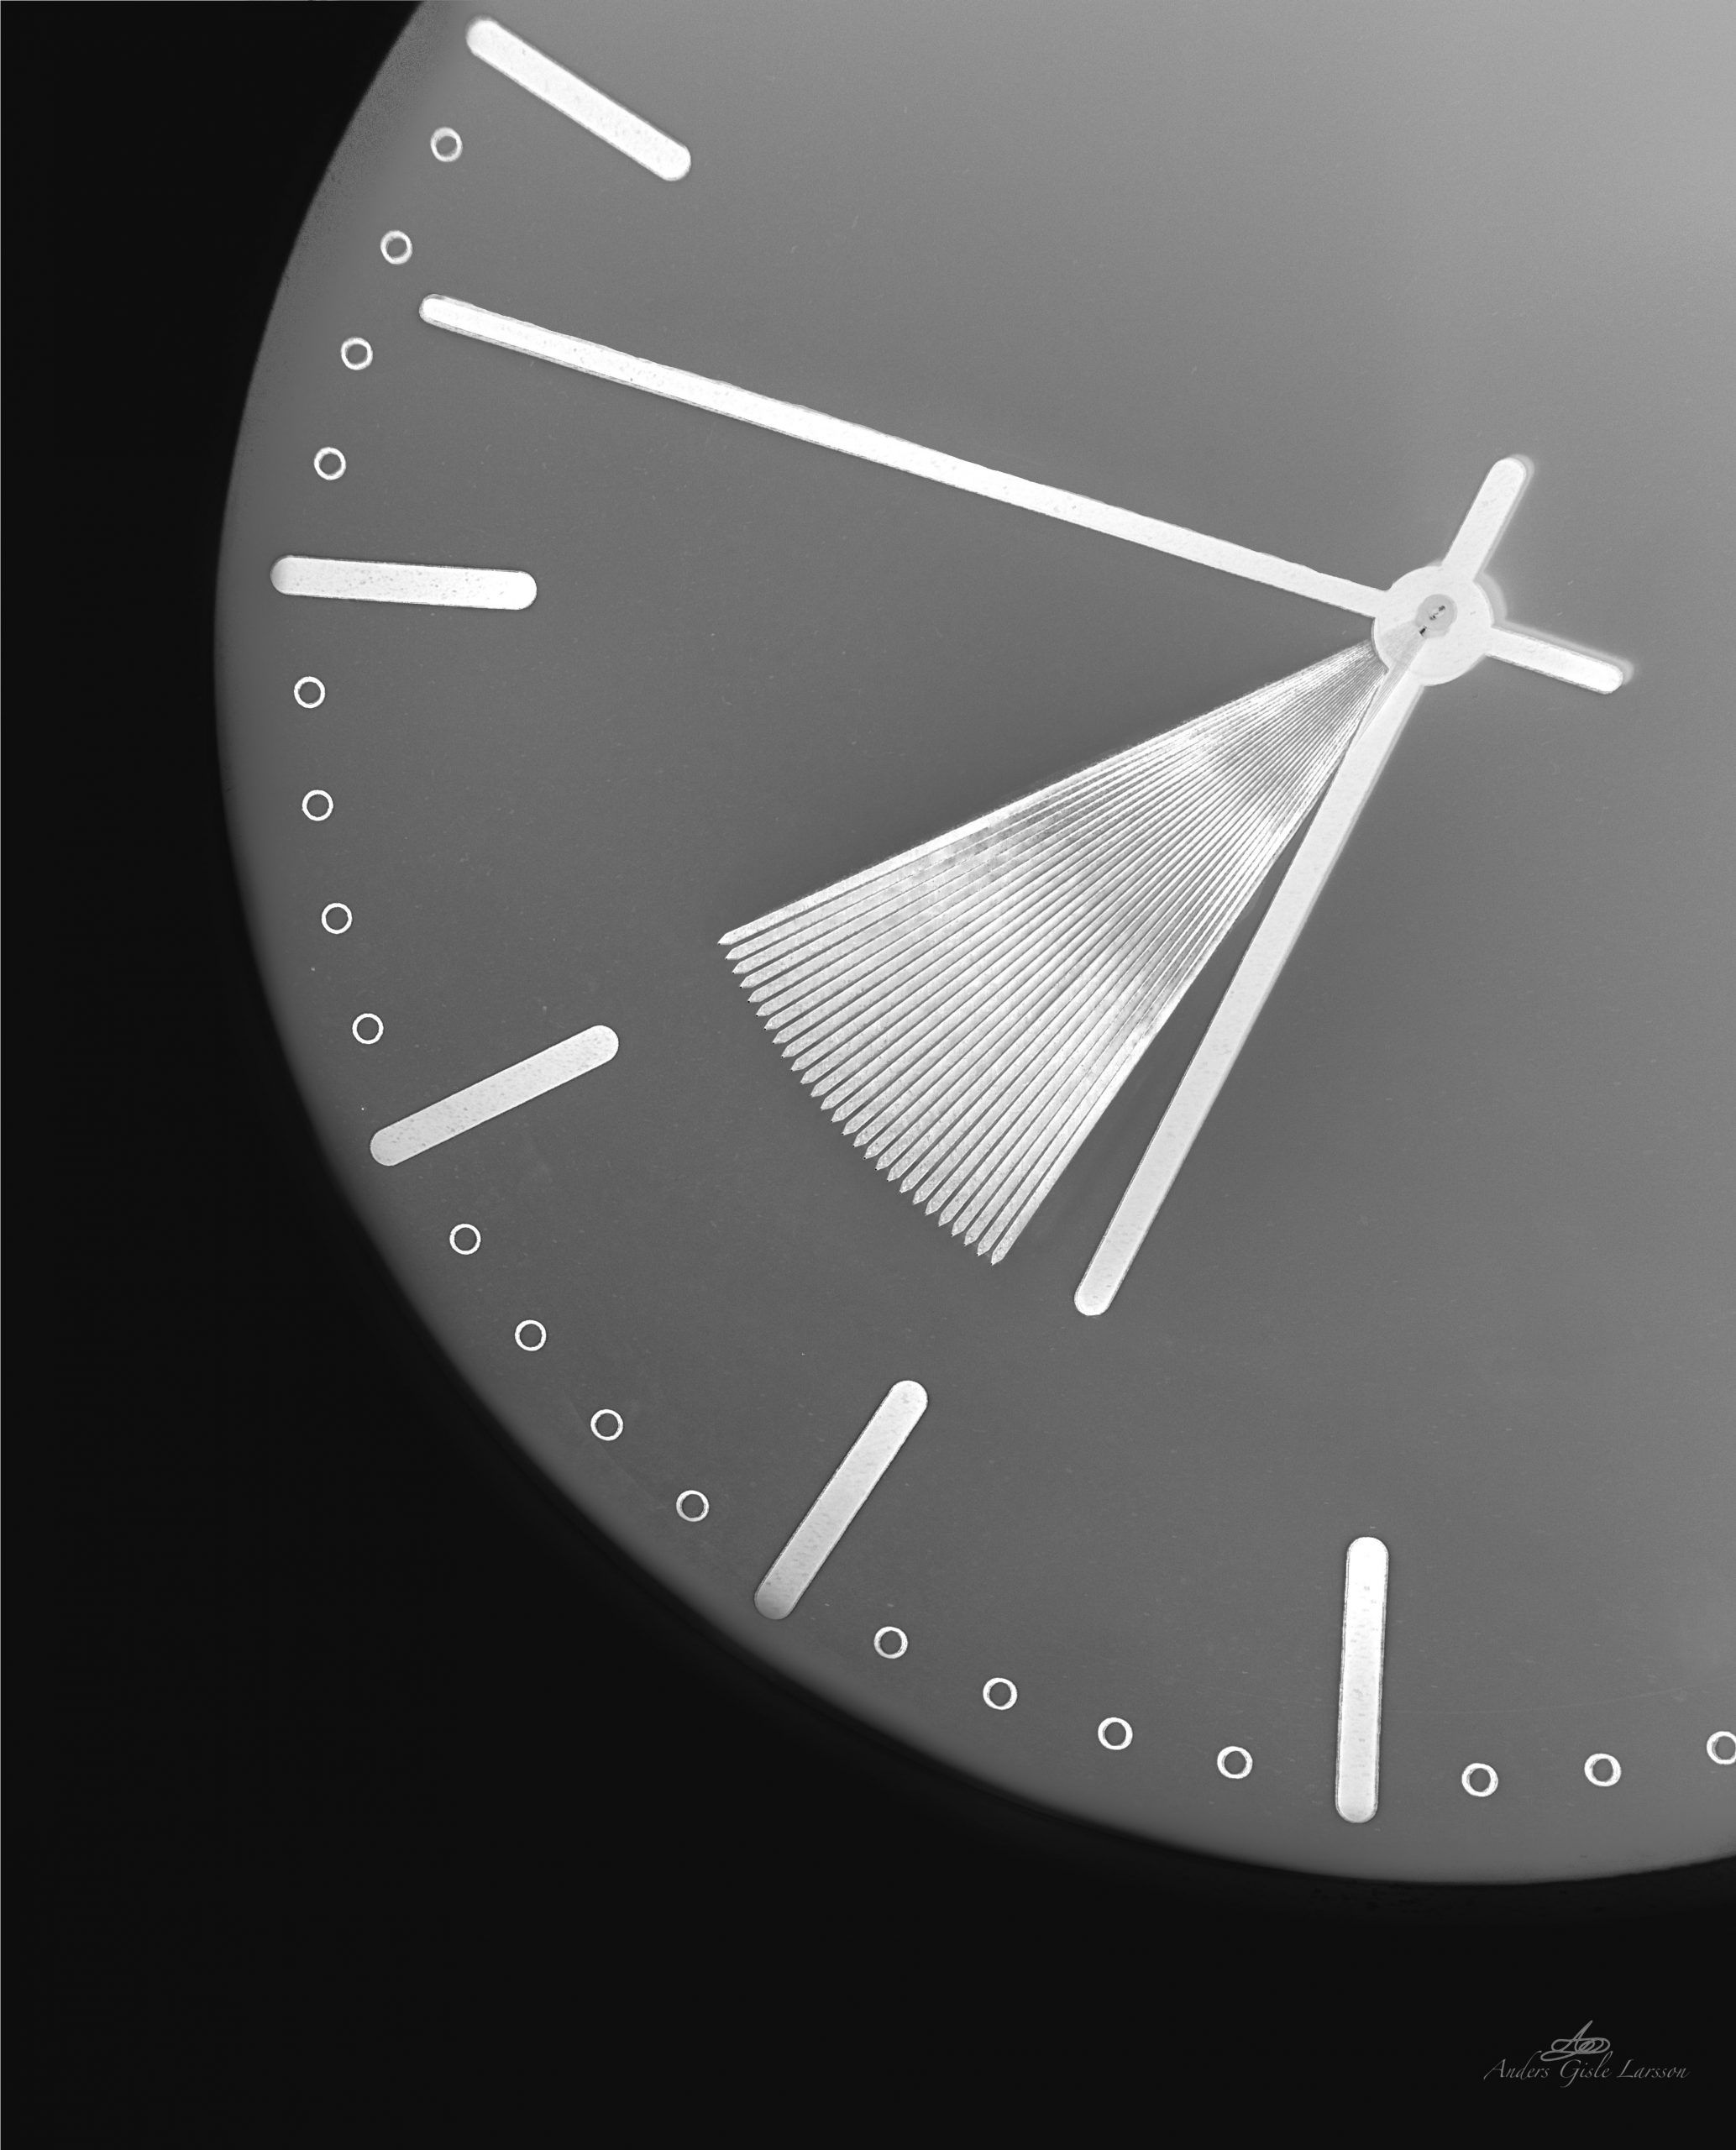 Timelapse, Manipulation, Uge 3, 15/365, Randers